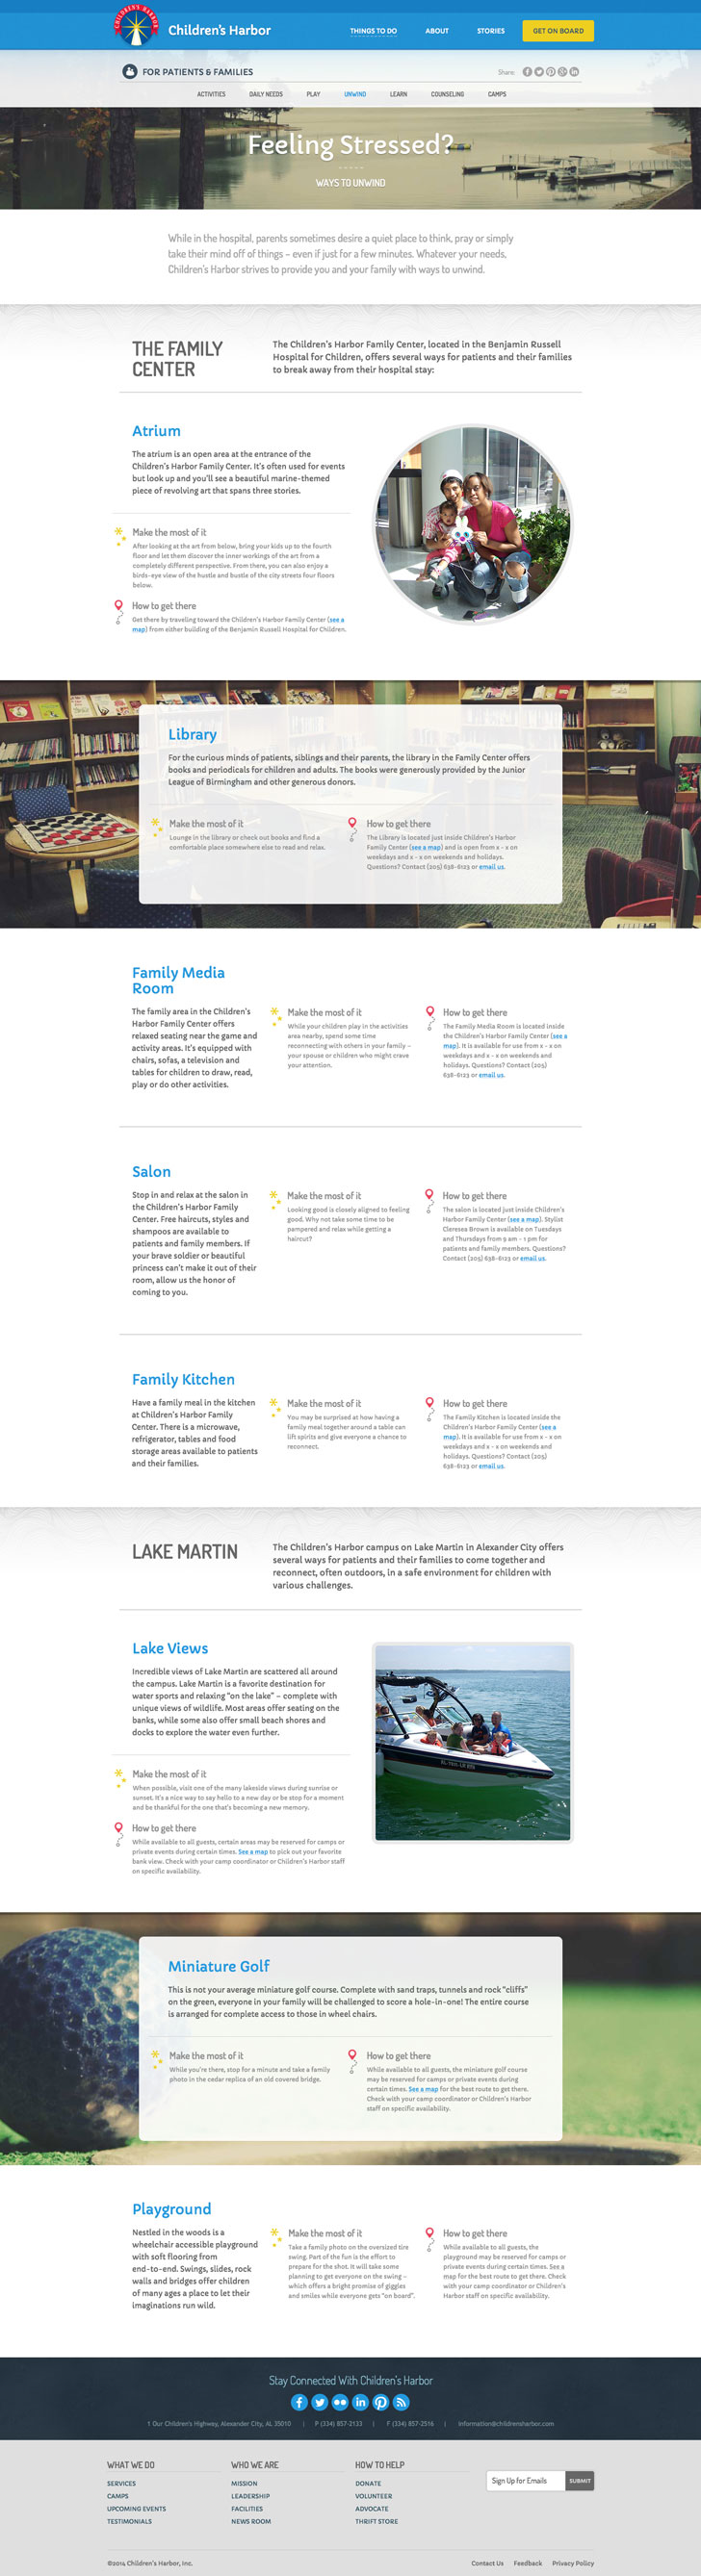 Children's Harbor content page